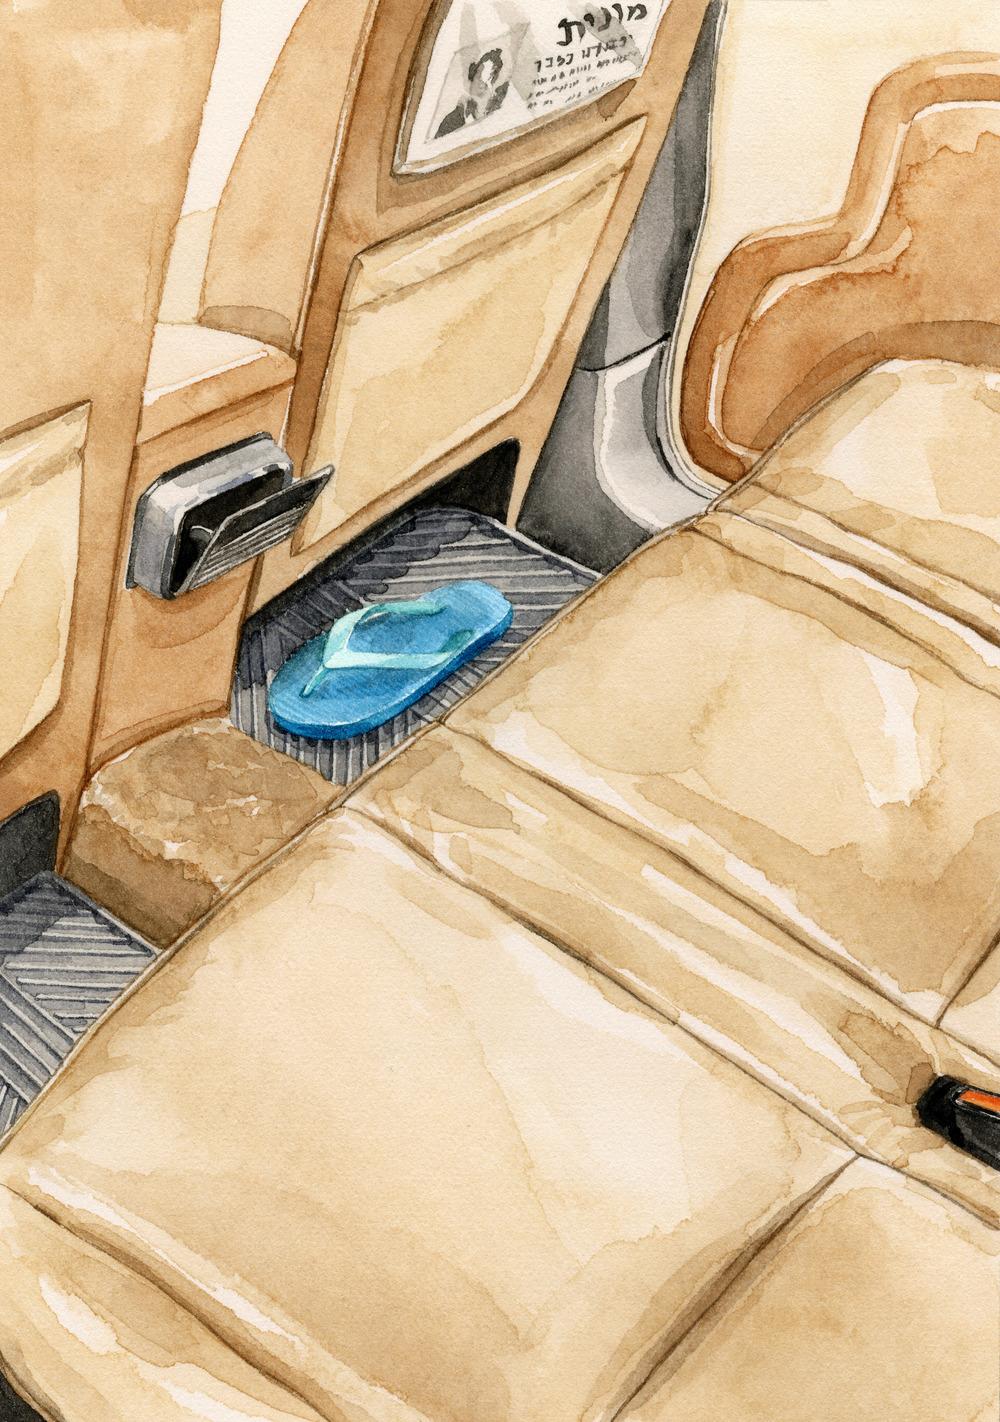 telaviv-taxi-web.jpg